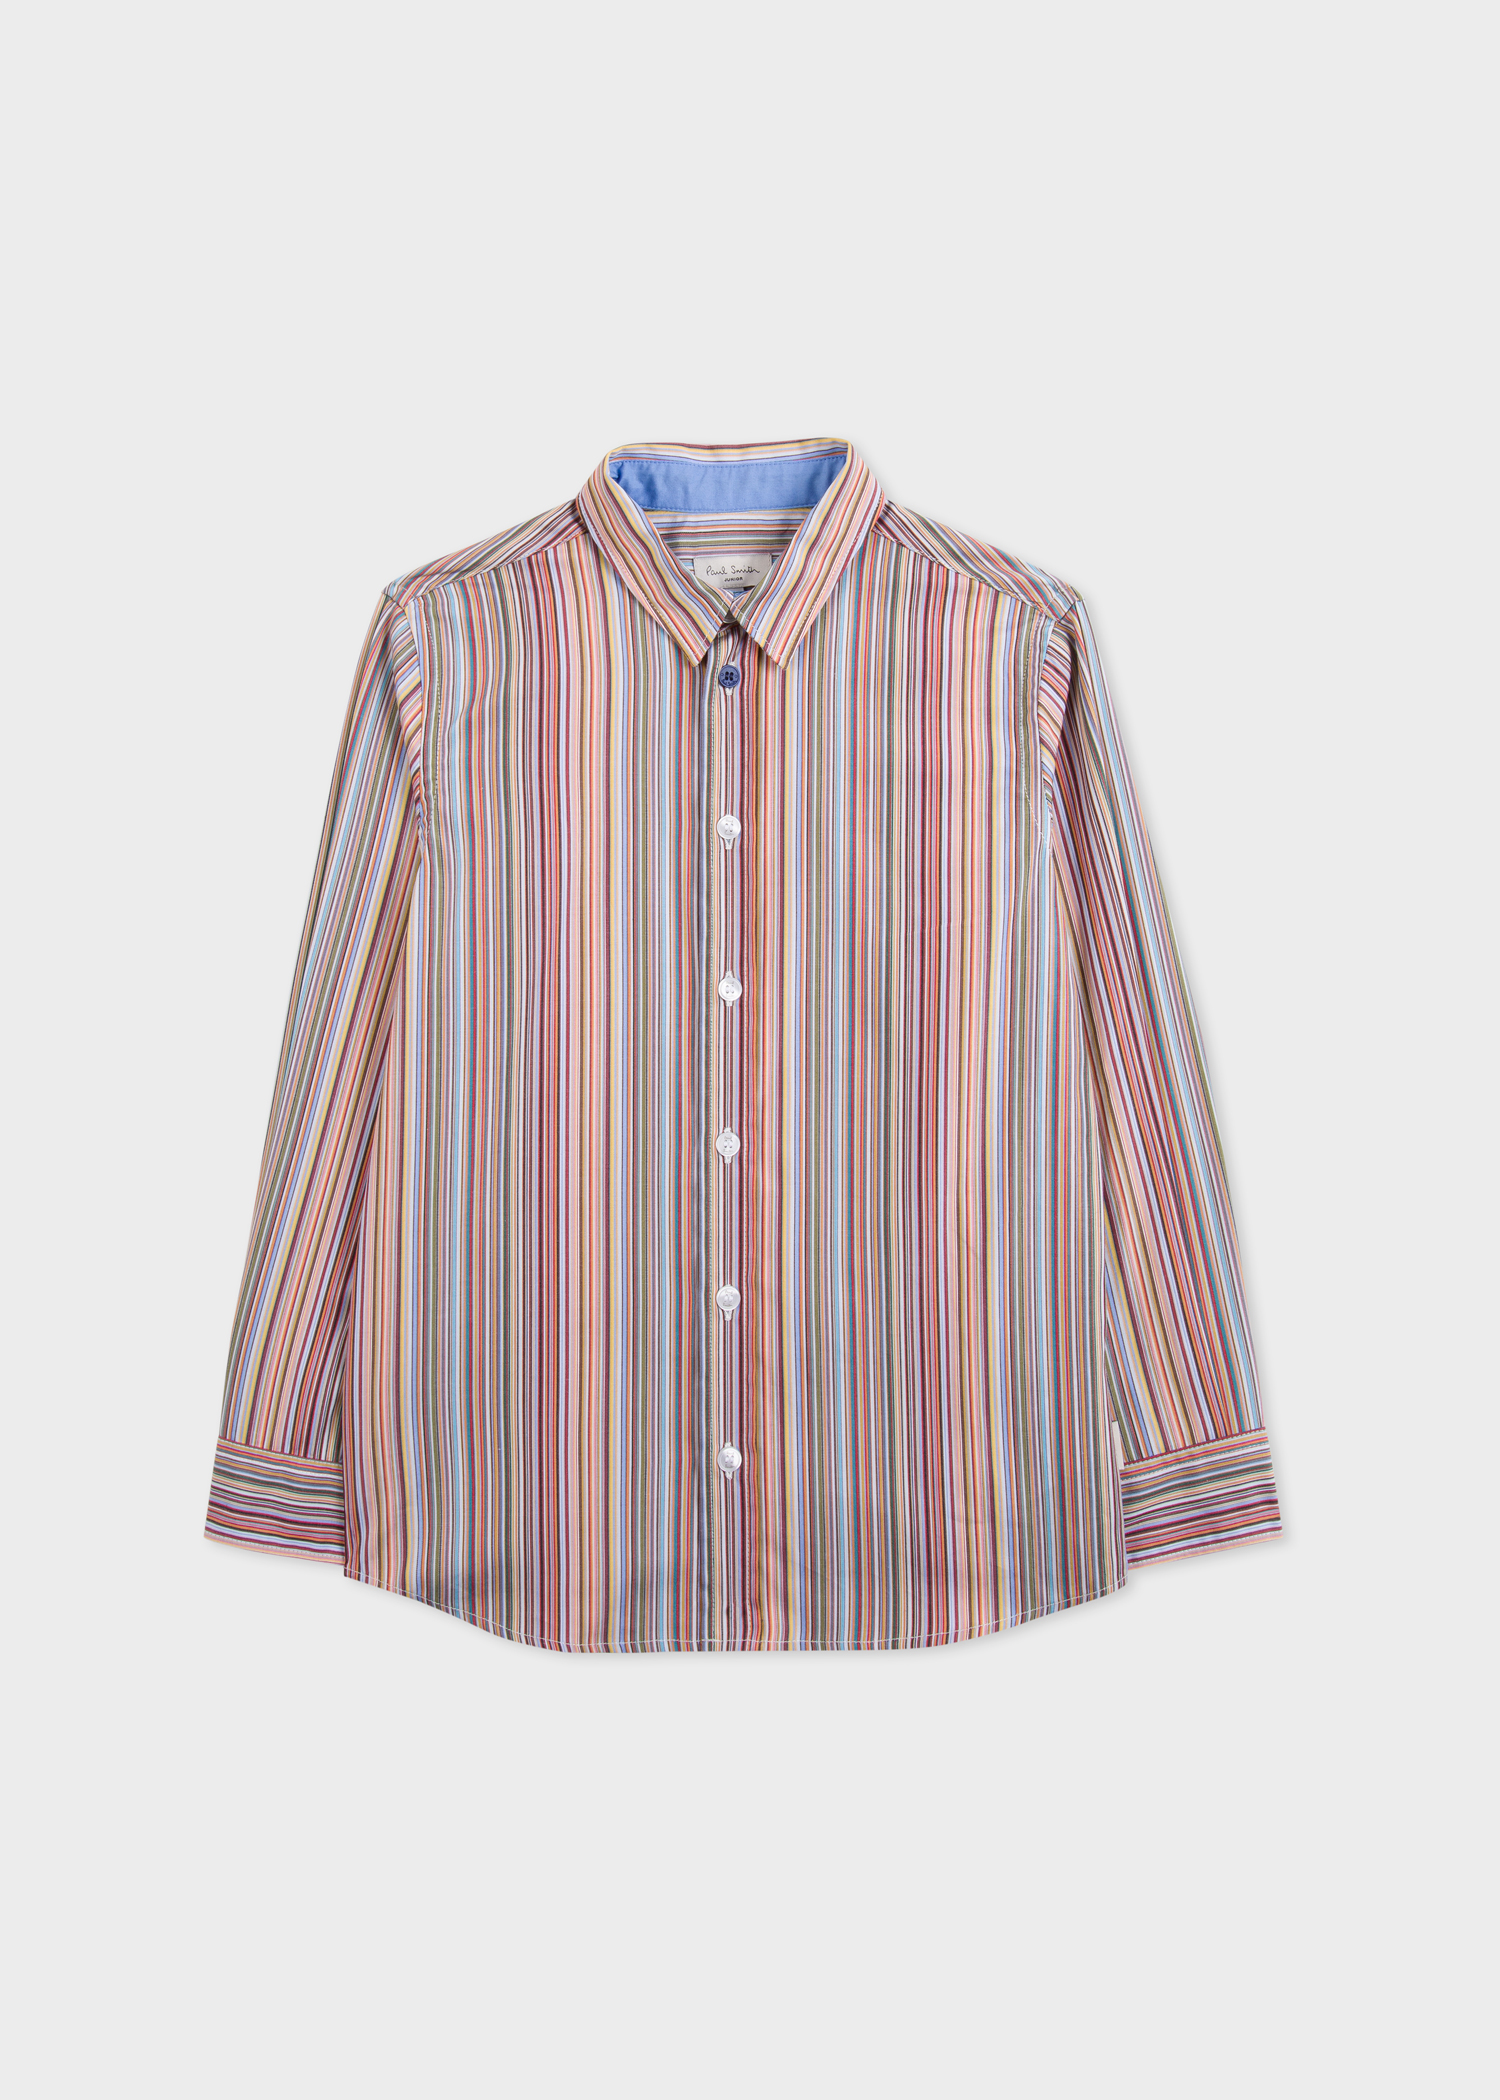 18a7d729c3389 Boys' 2-6 Years Signature Stripe Cotton Shirt